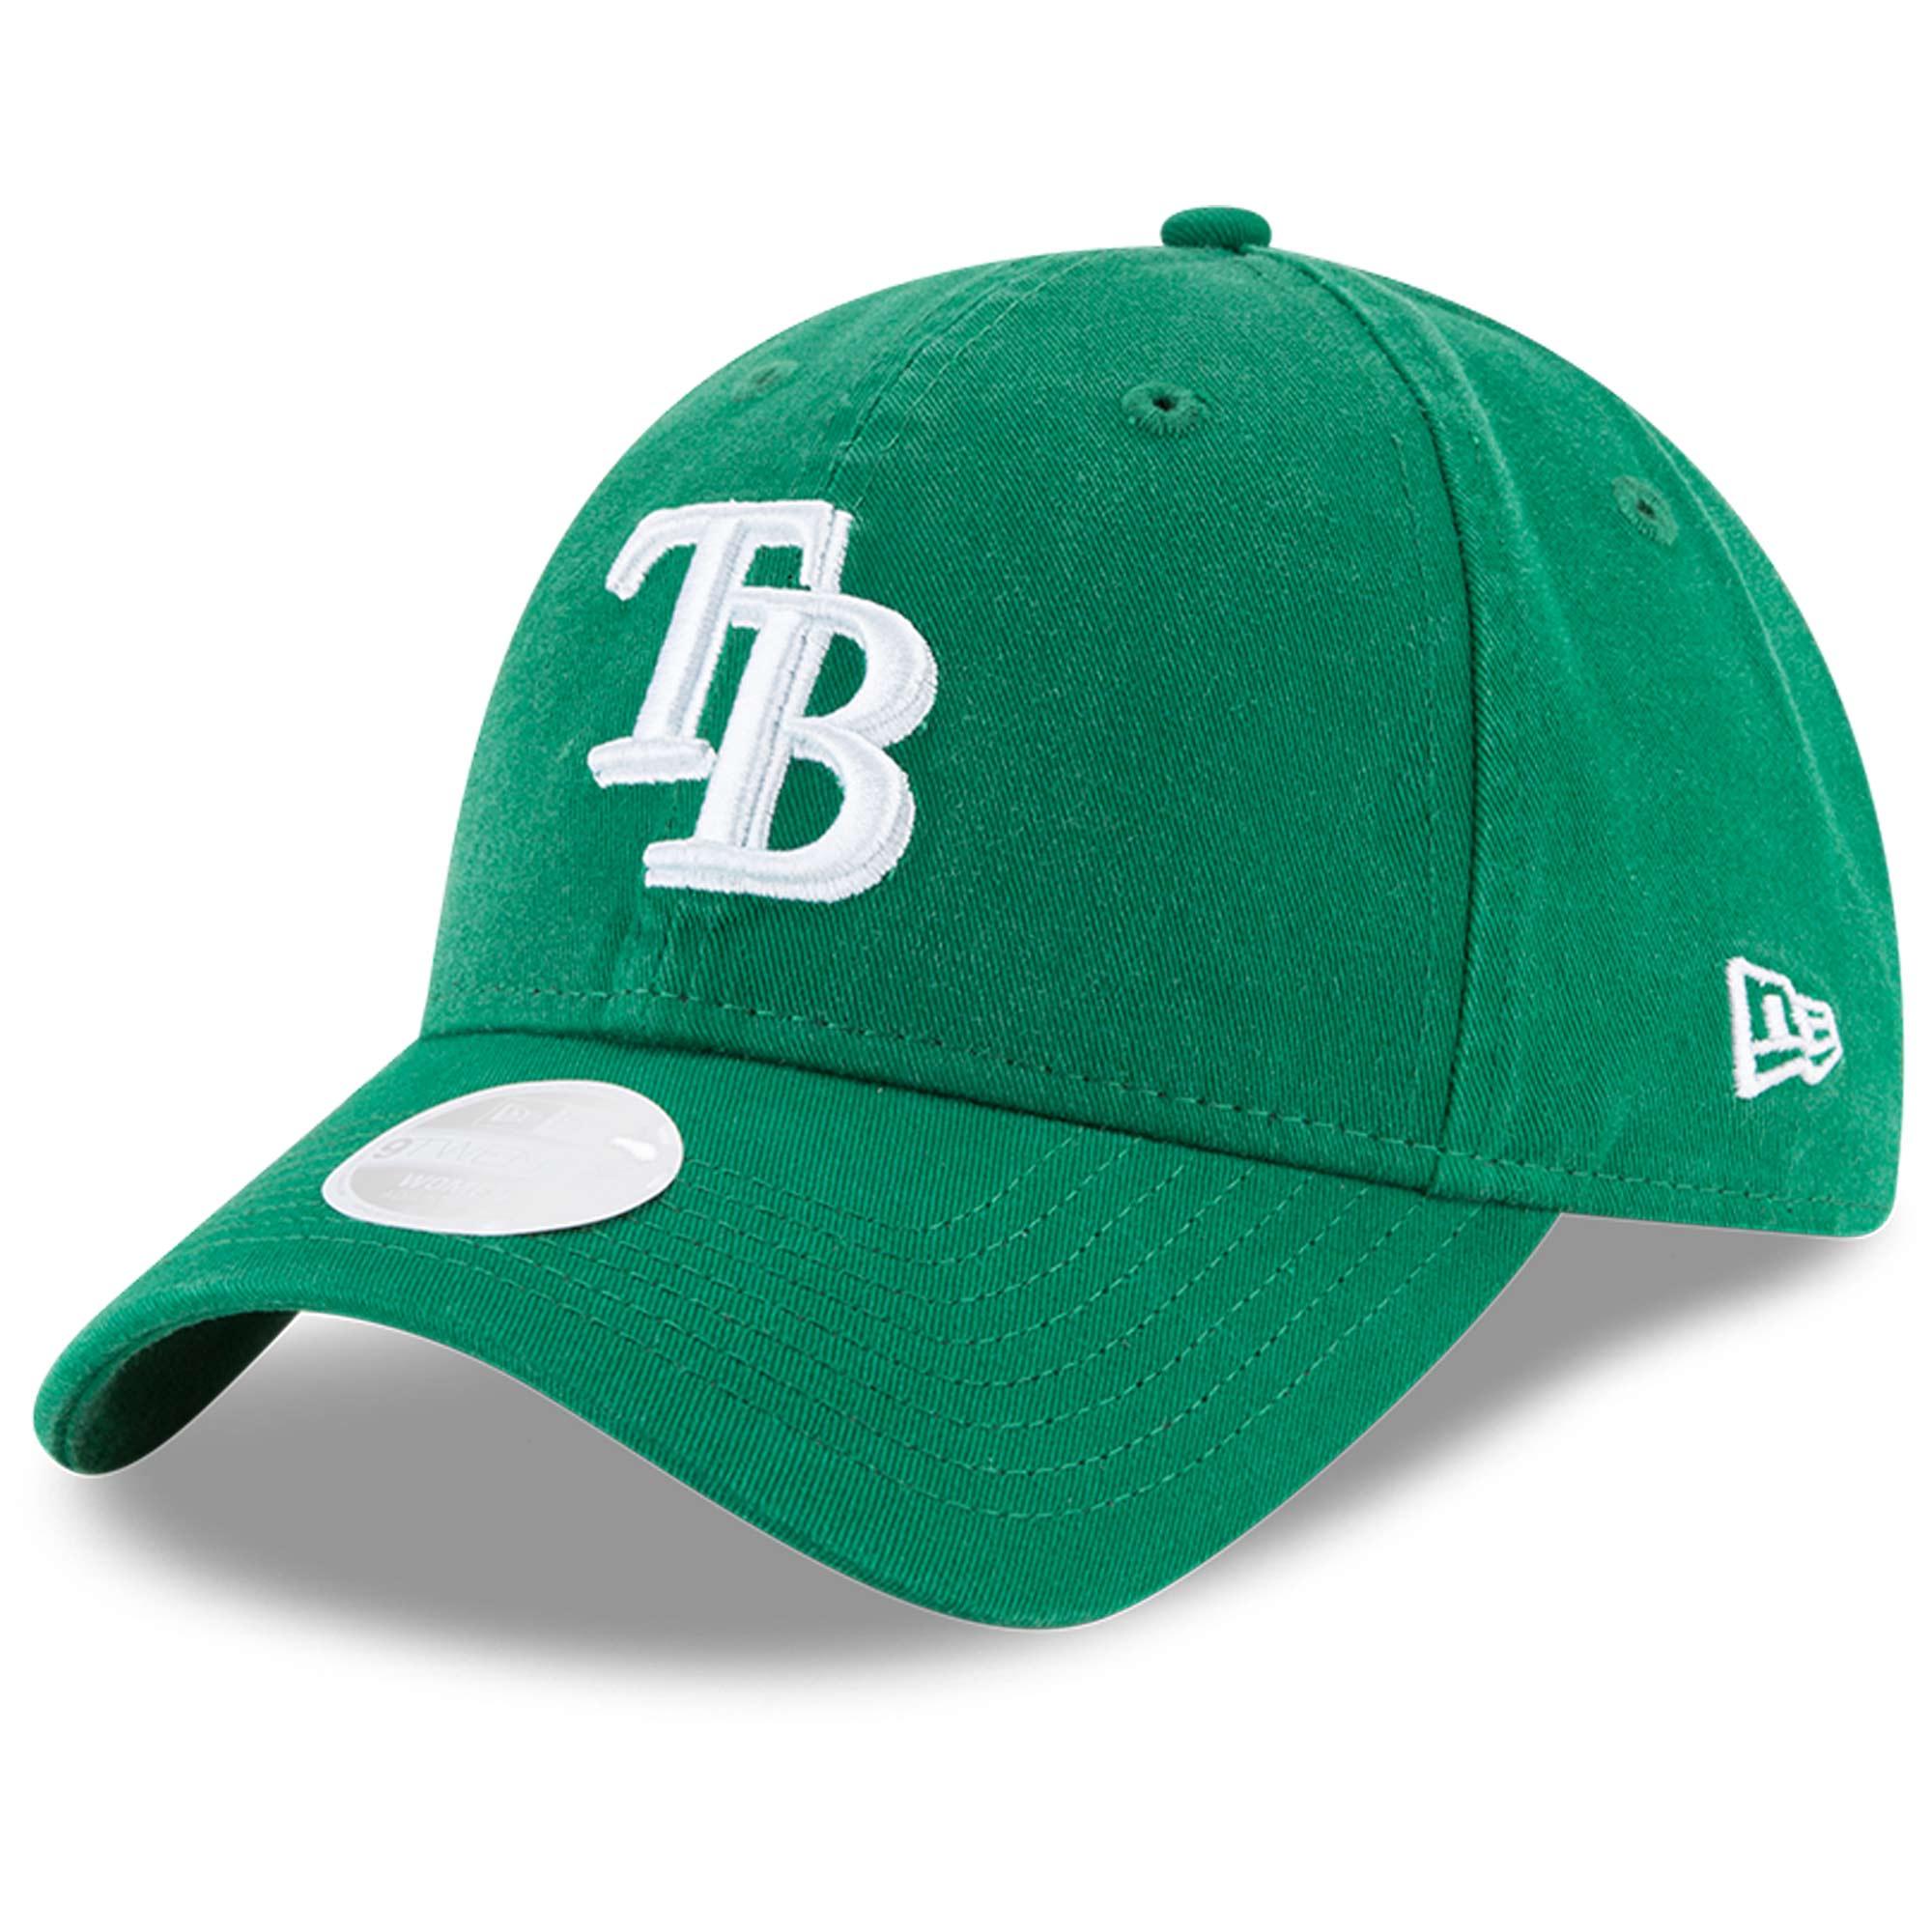 Tampa Bay Rays New Era Women's Core Classic Twill St. Patrick's Day 9TWENTY Adjustable Hat - Green - OSFA